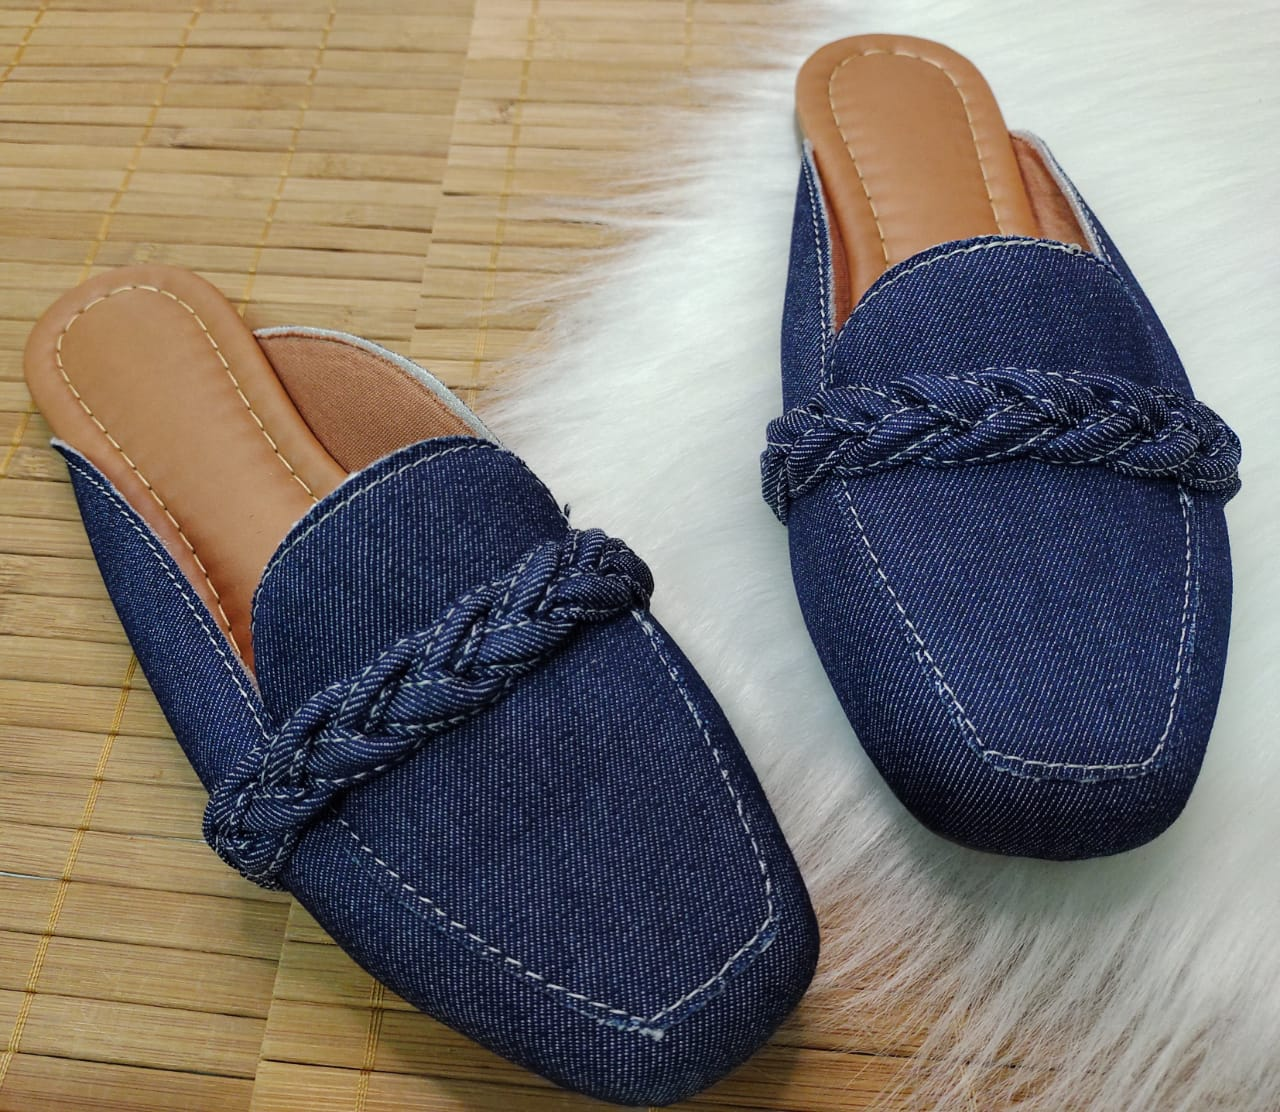 Mulle  Confort Palmilha Confort - Jeans Com Detalhe de Corda do Mesmo Material.